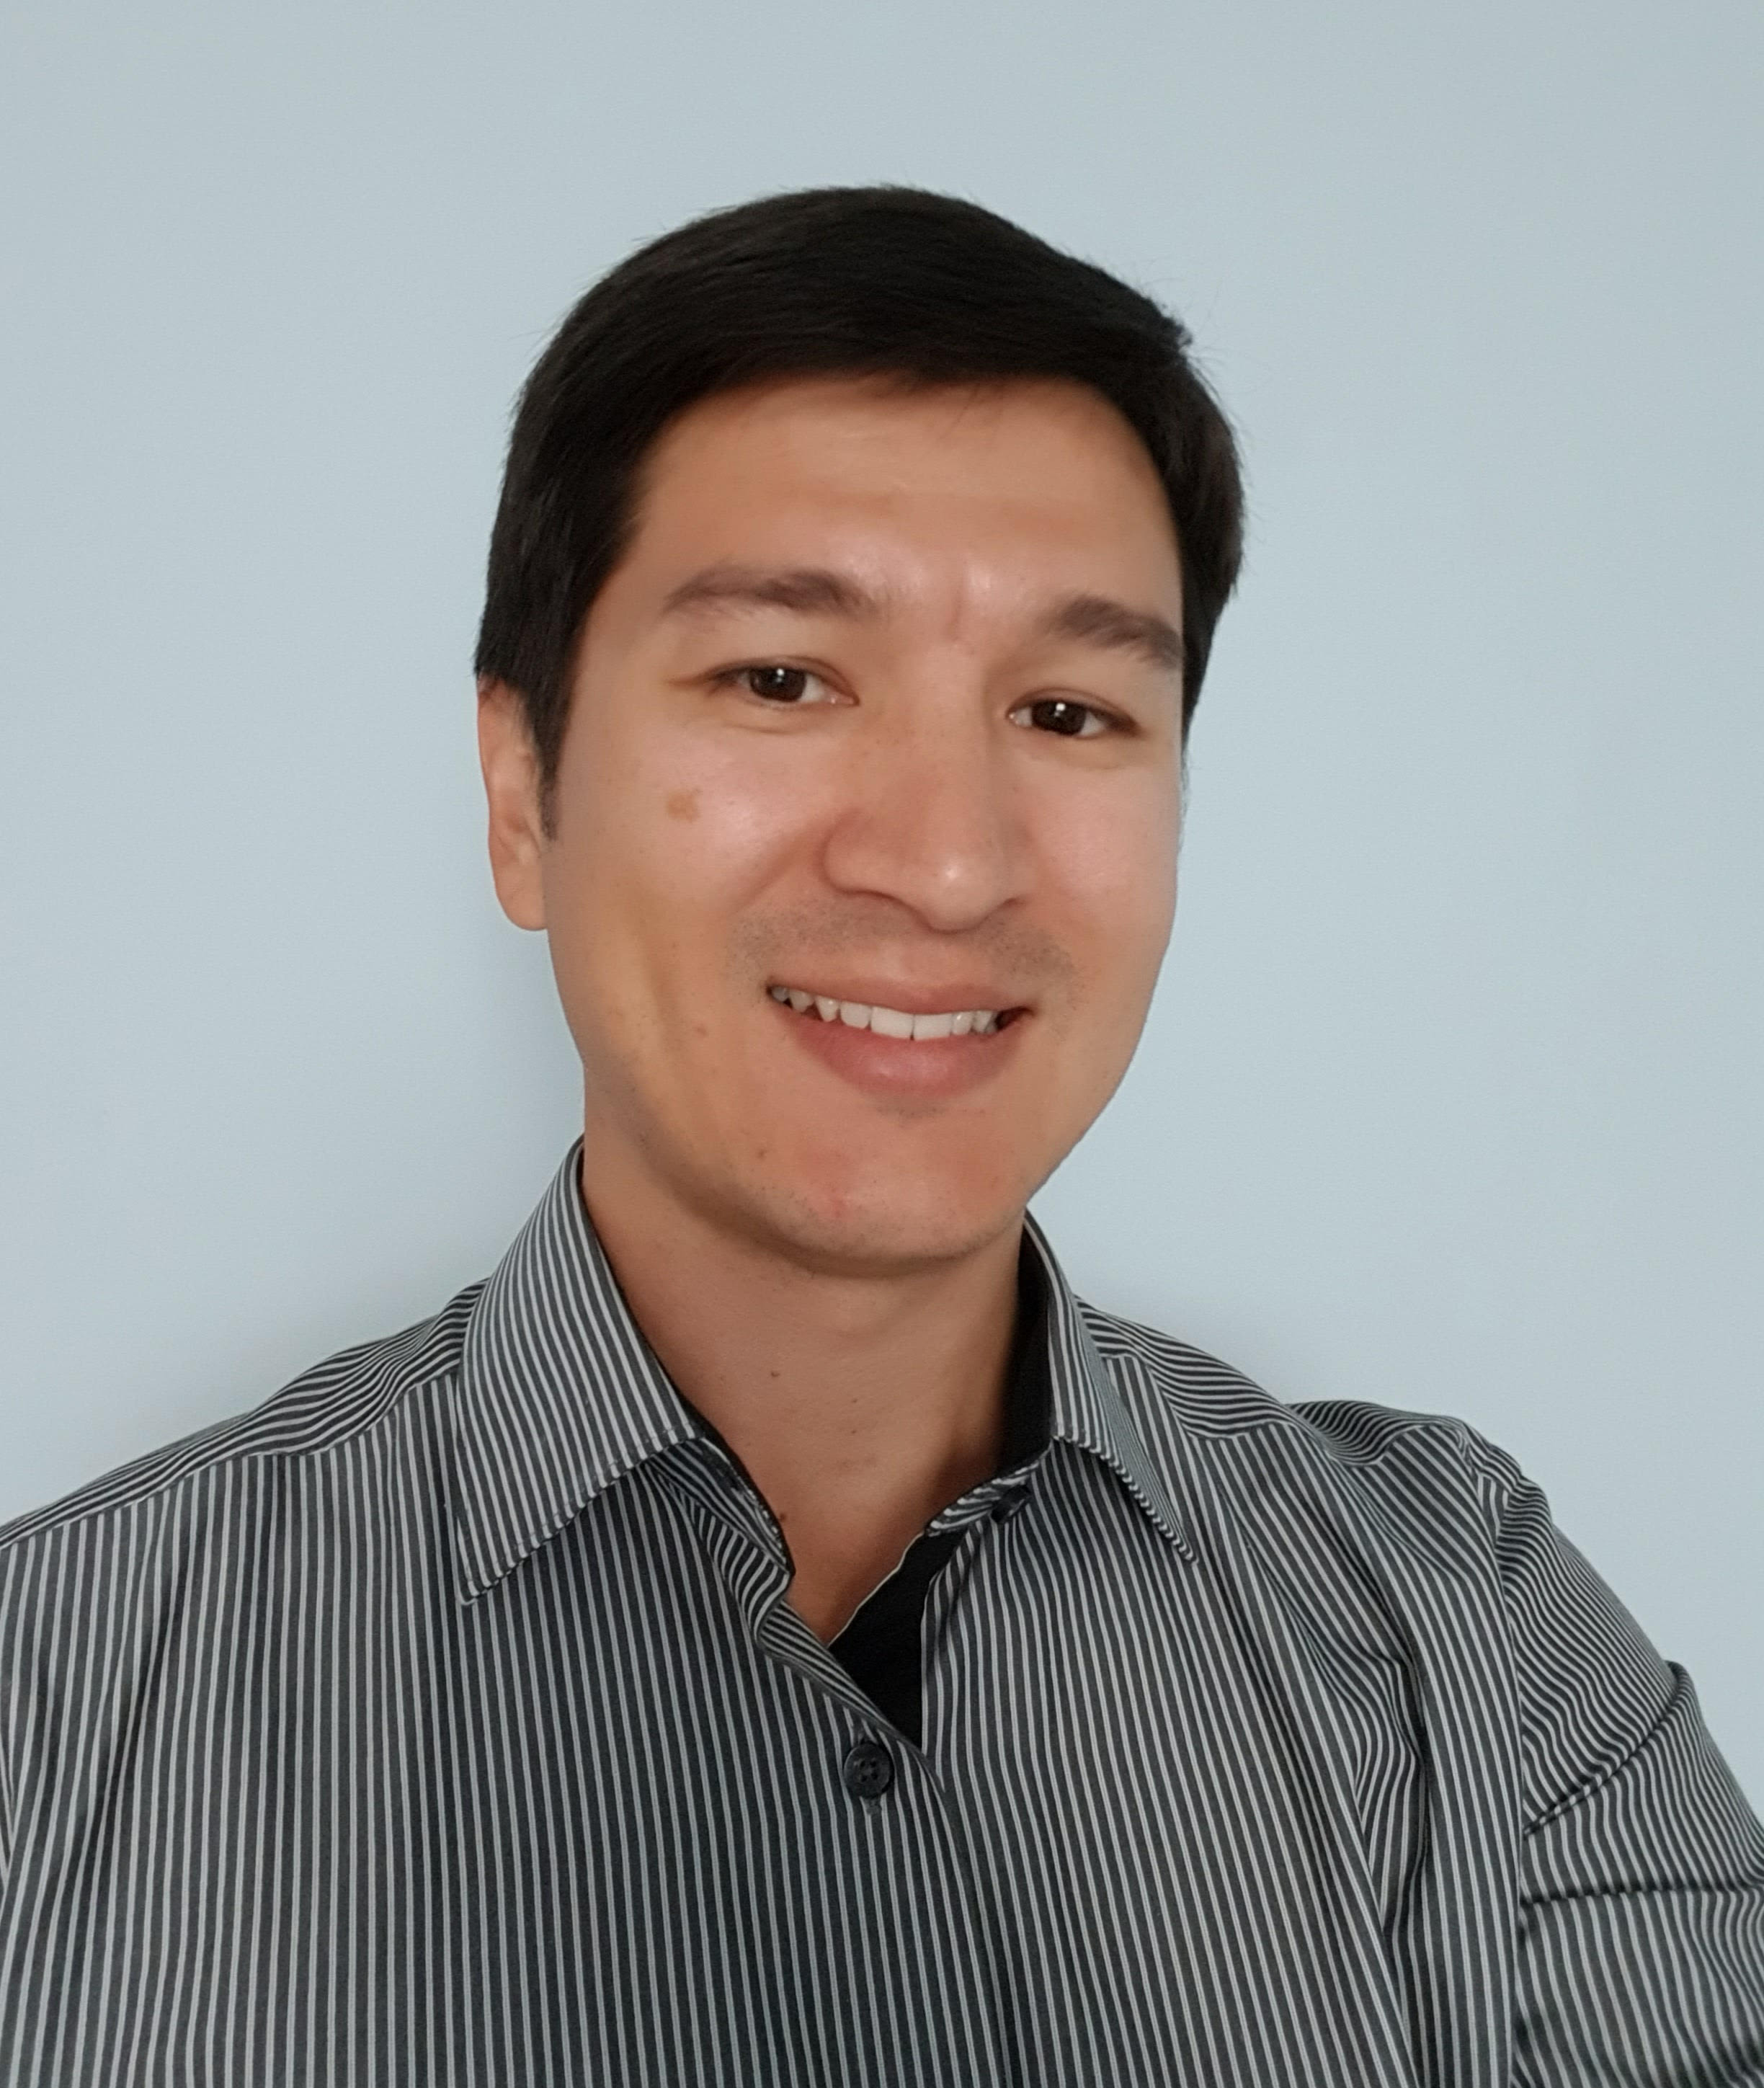 CEO of Telos Technologies, LLC